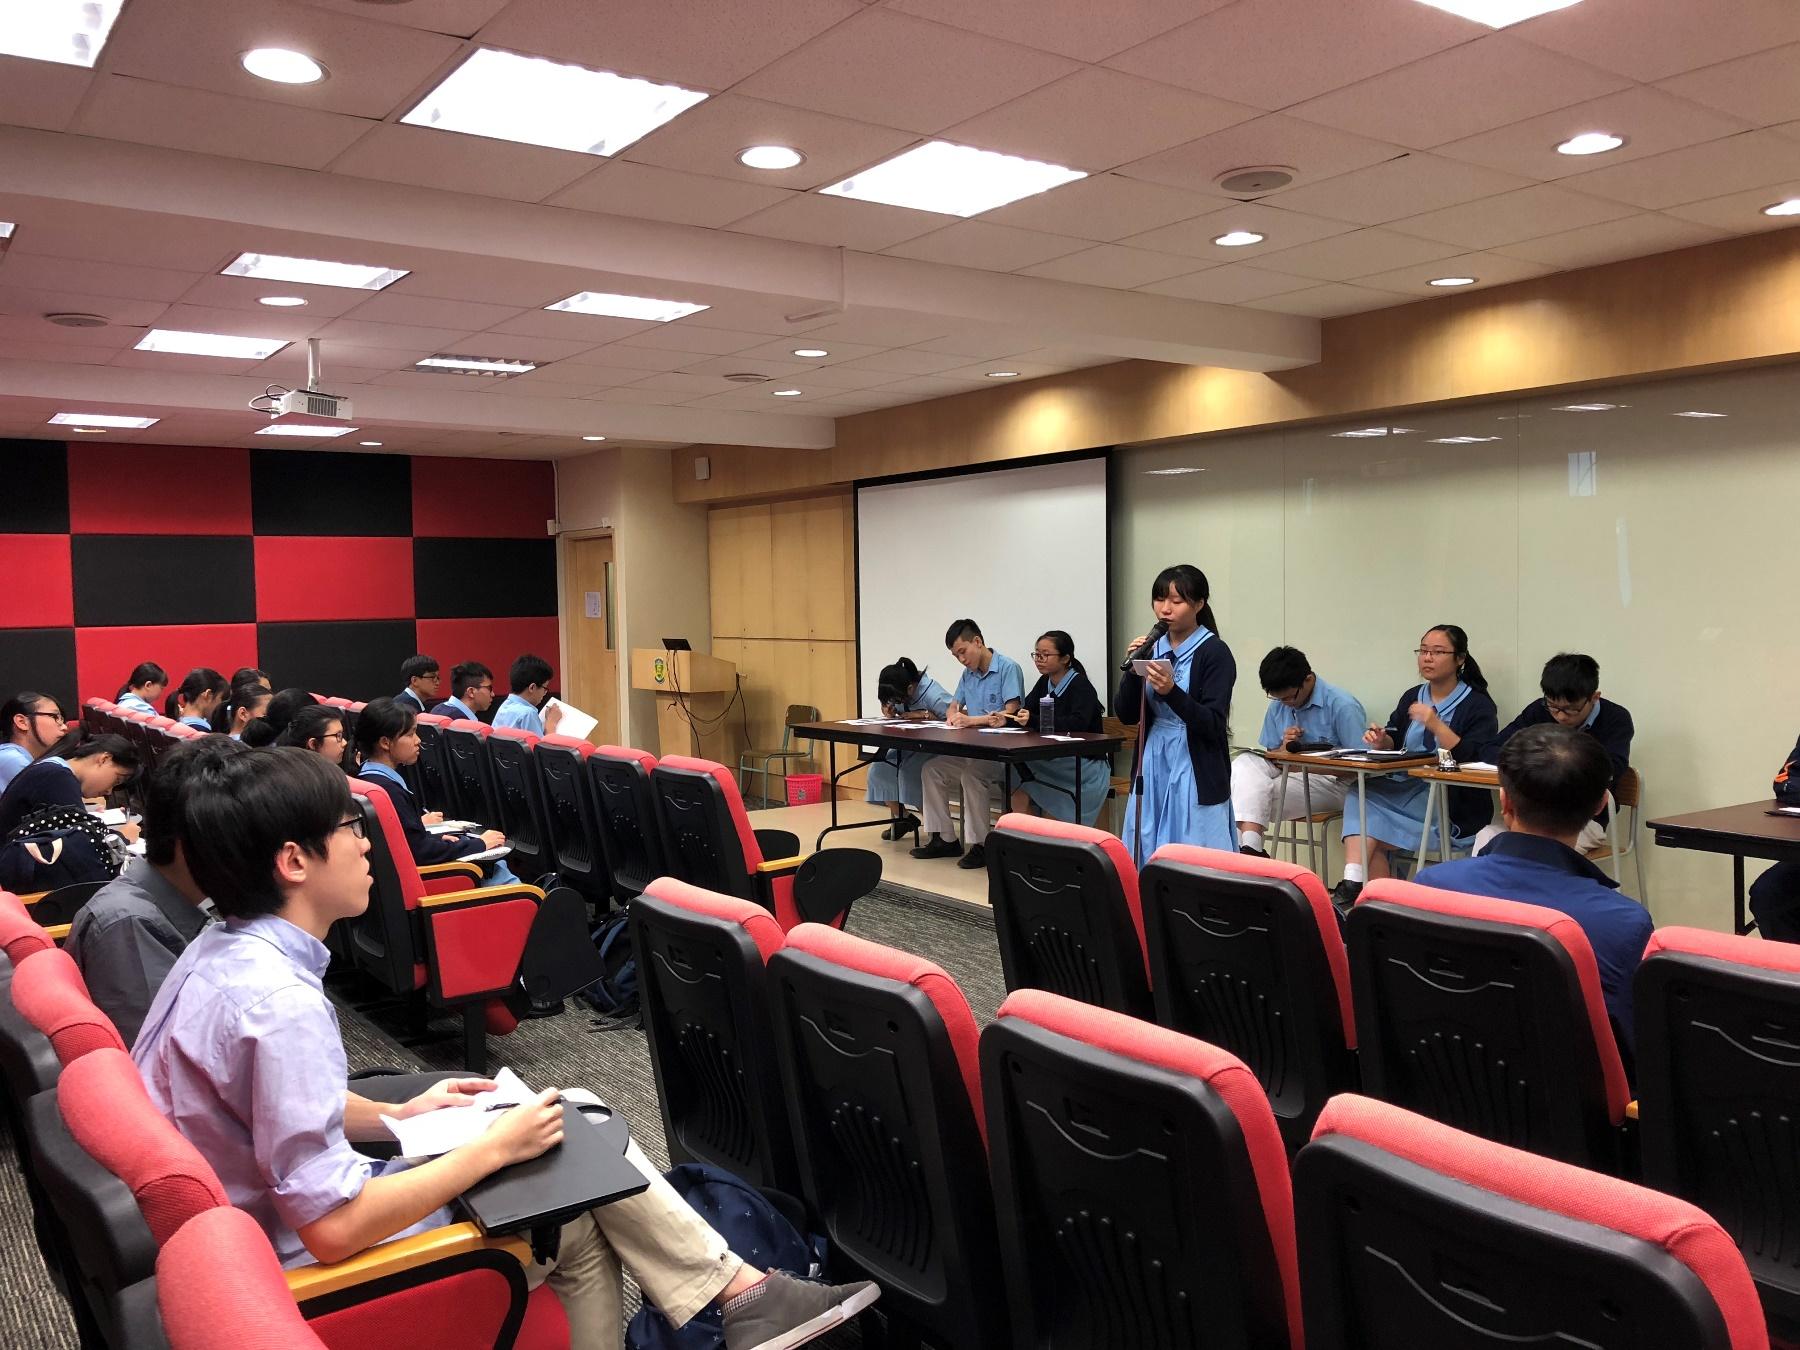 http://www.npc.edu.hk/sites/default/files/2_1300.jpg